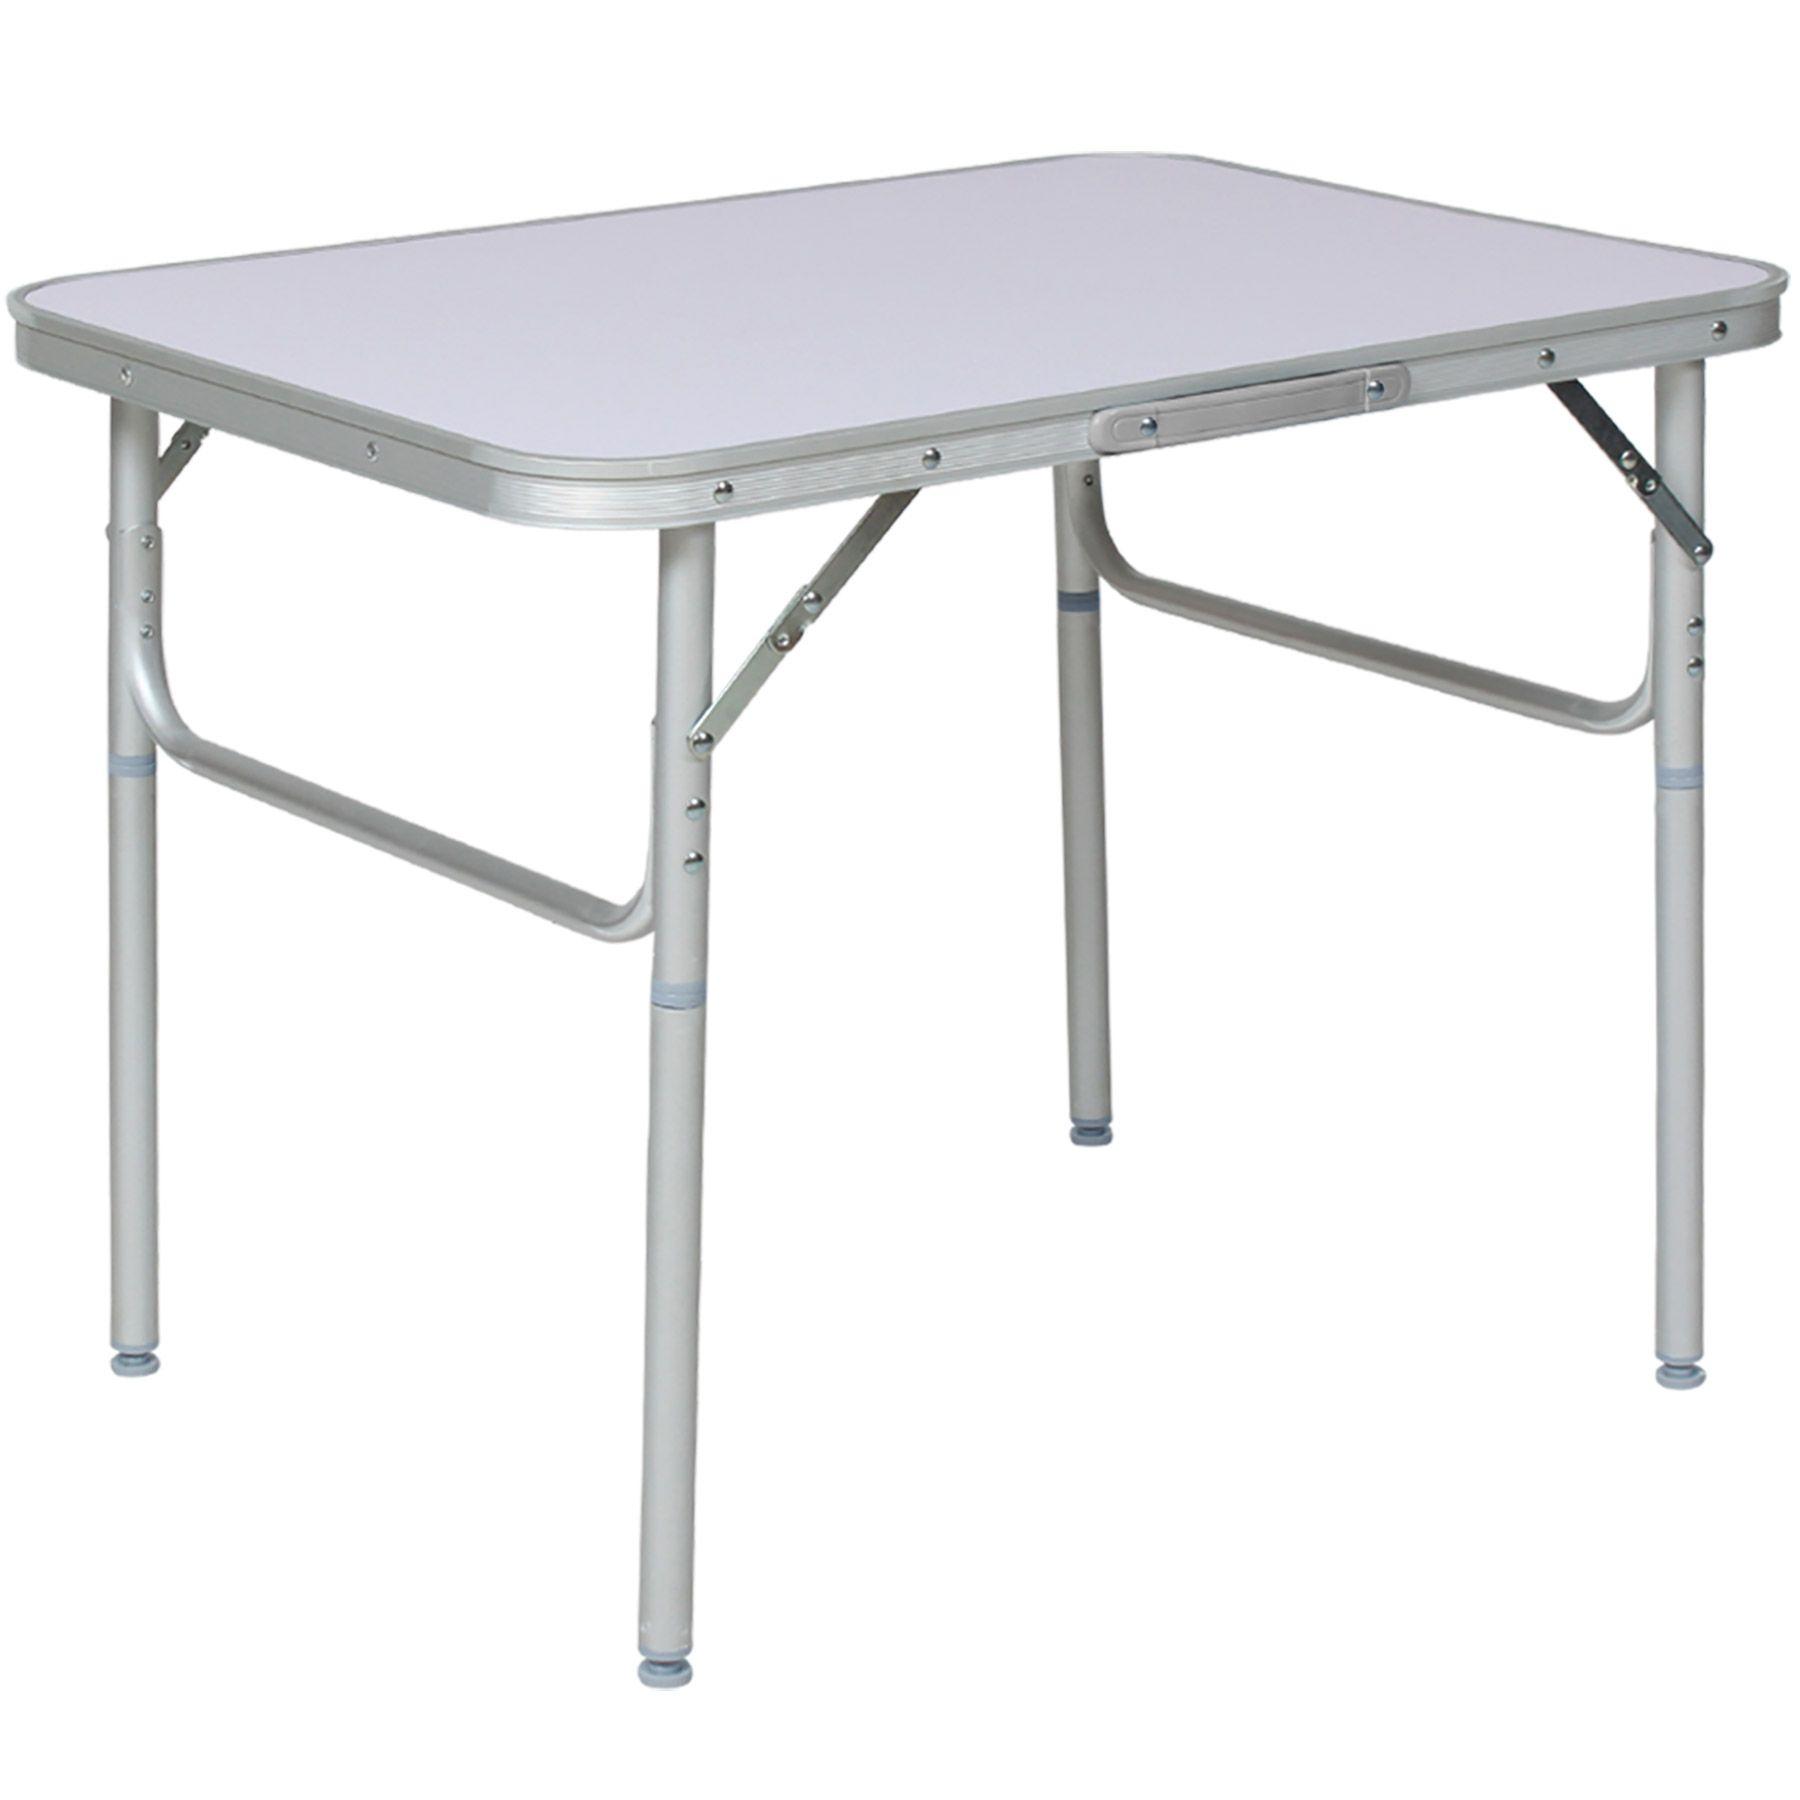 details sur table pliante de camping jardin bbq barbecue pique nique portable en aluminium